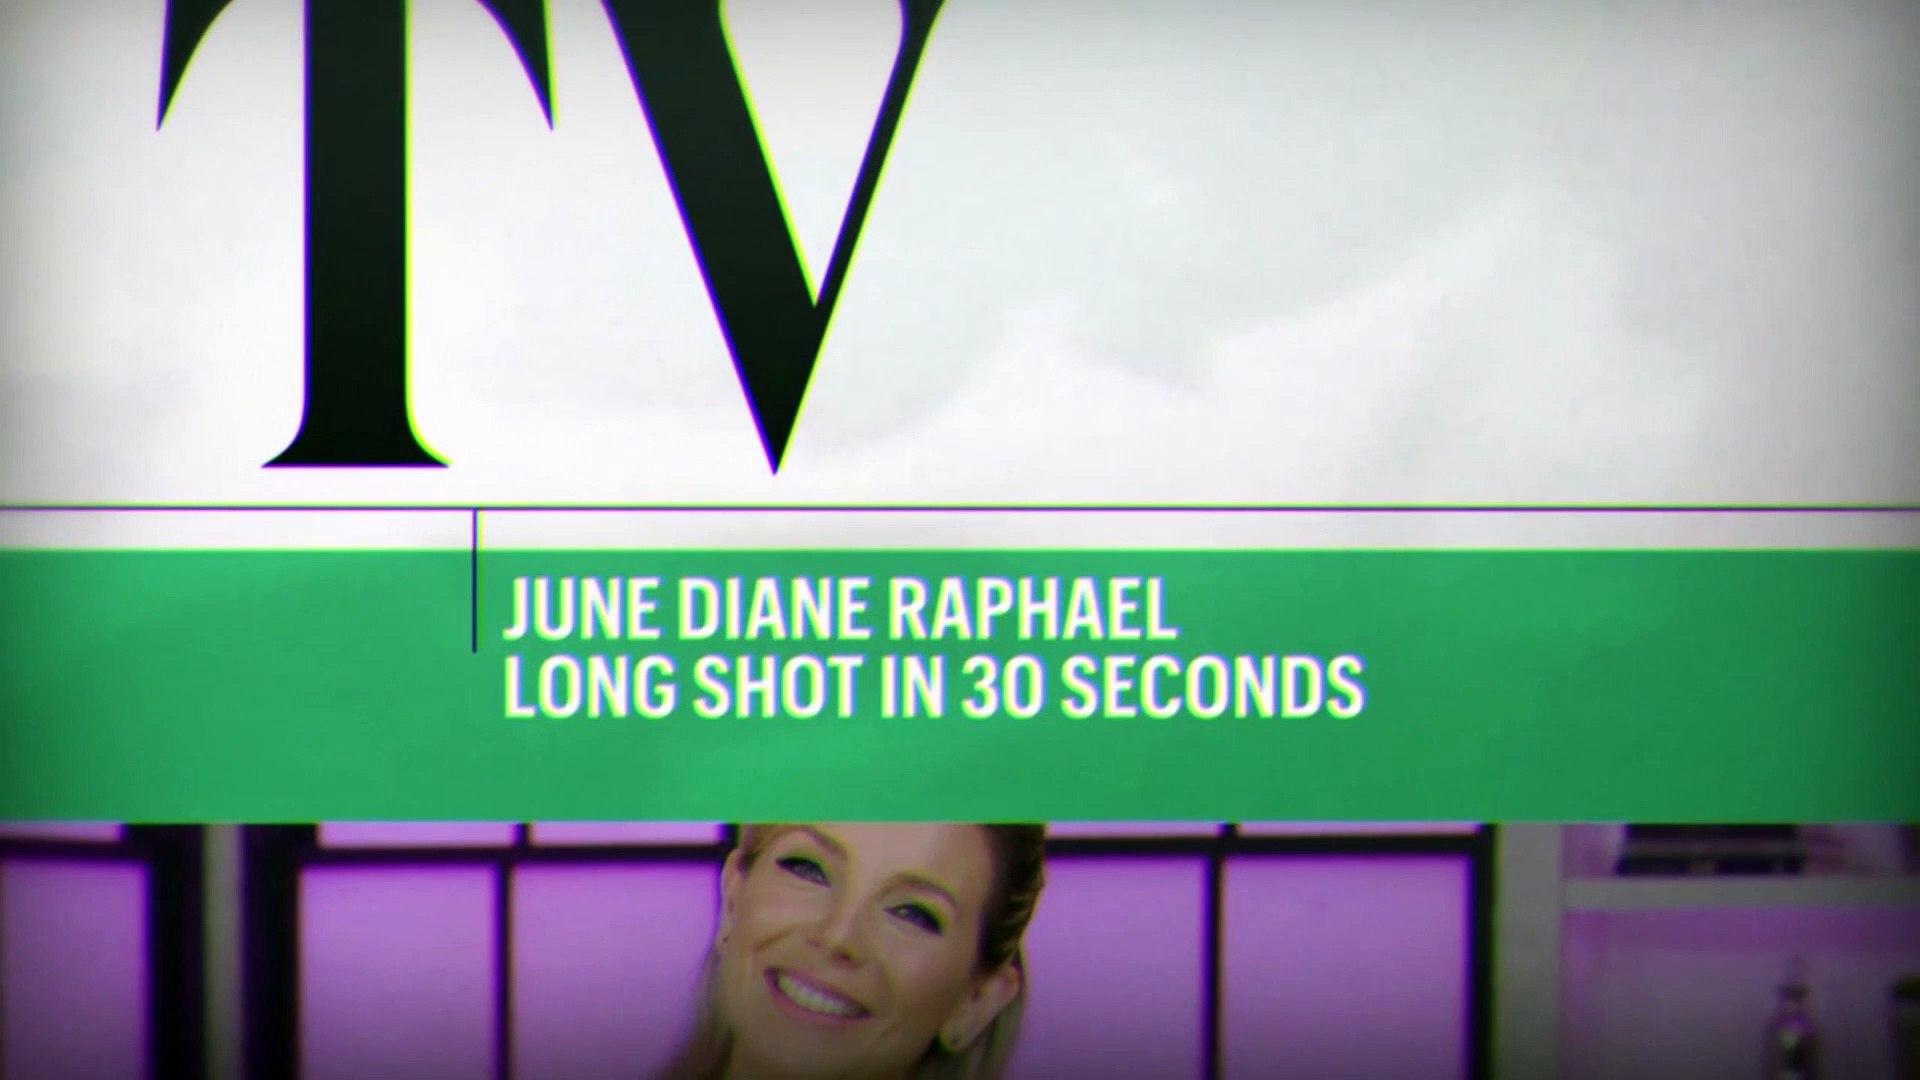 June Diane Raphael Explains 'Long Shot' In 30 Seconds | Entertainment Weekly